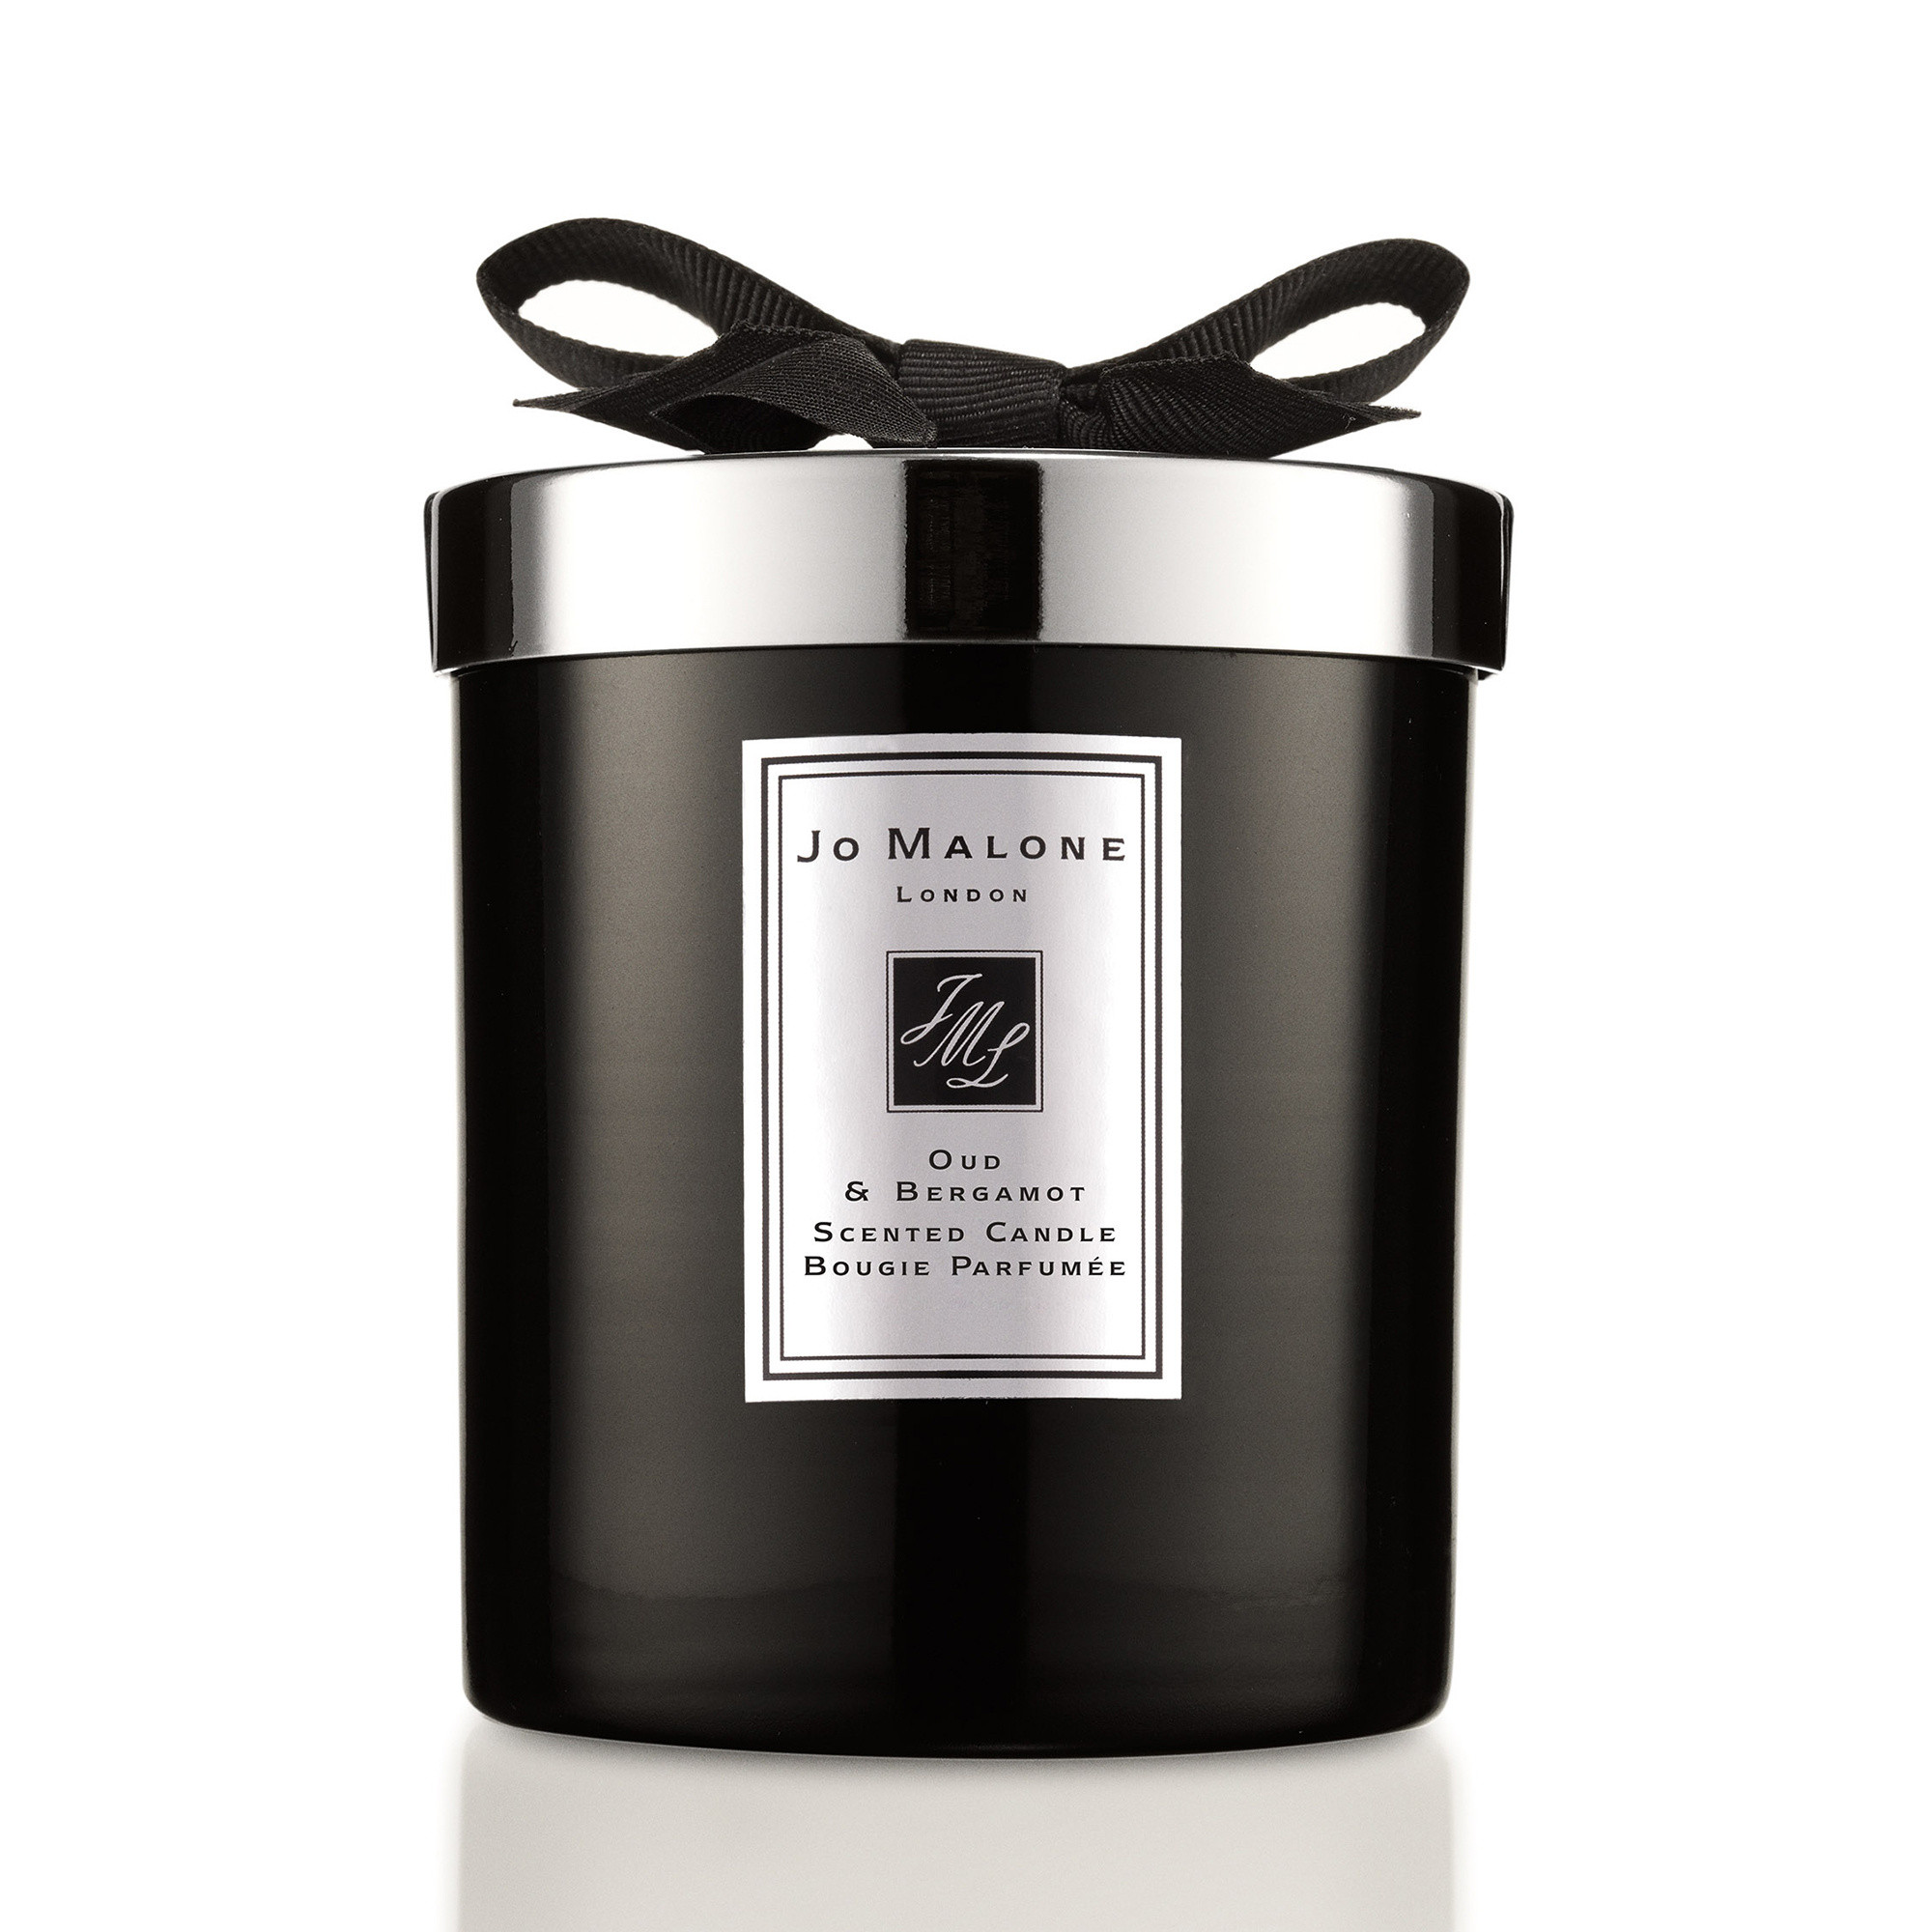 Jo Malone London oud & bergamot home candle intense 200 g, Nero, large image number 0